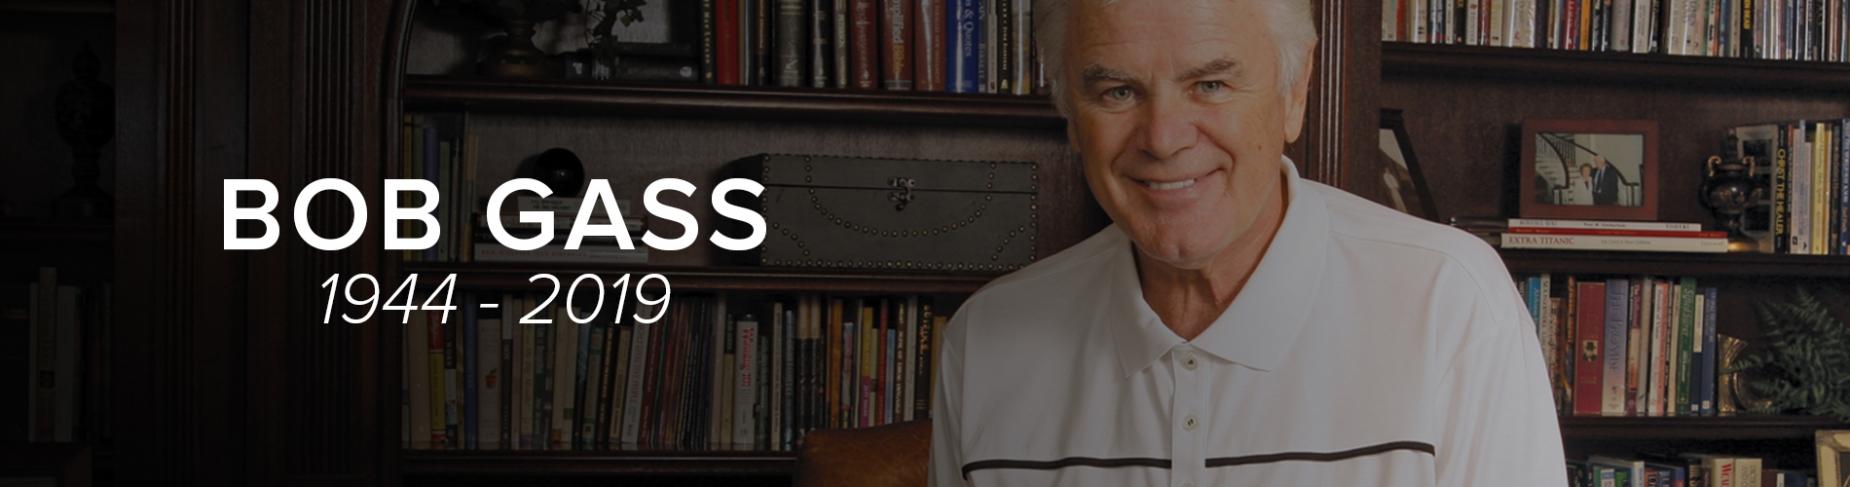 Bob Gass 1944 –2019